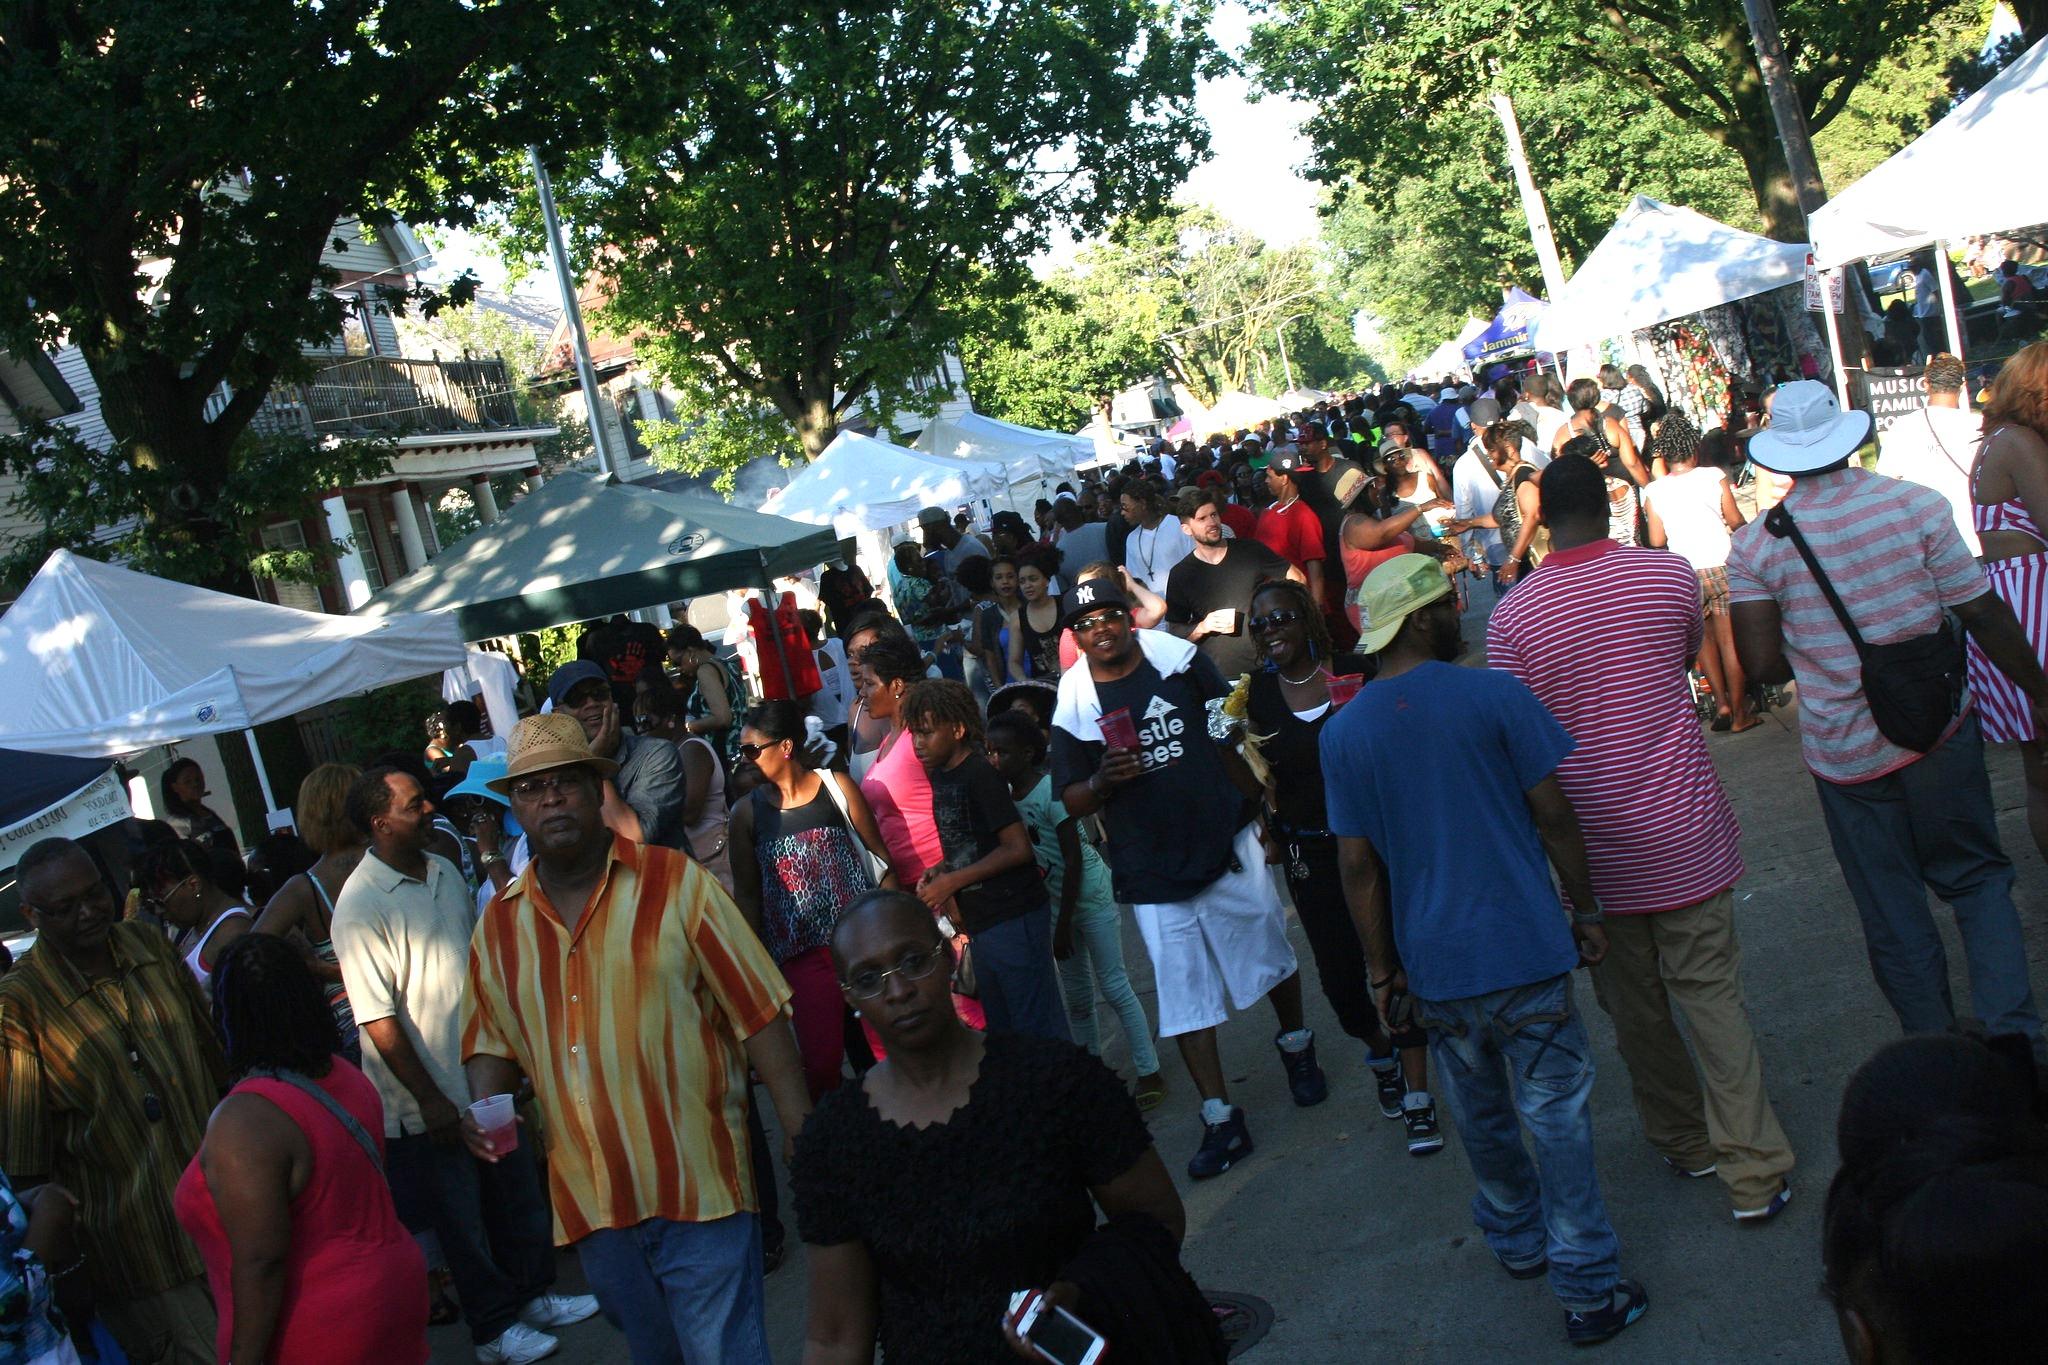 Garfield Avenue Festival drew large crowds last year. (Photo by Jabril Faraj)